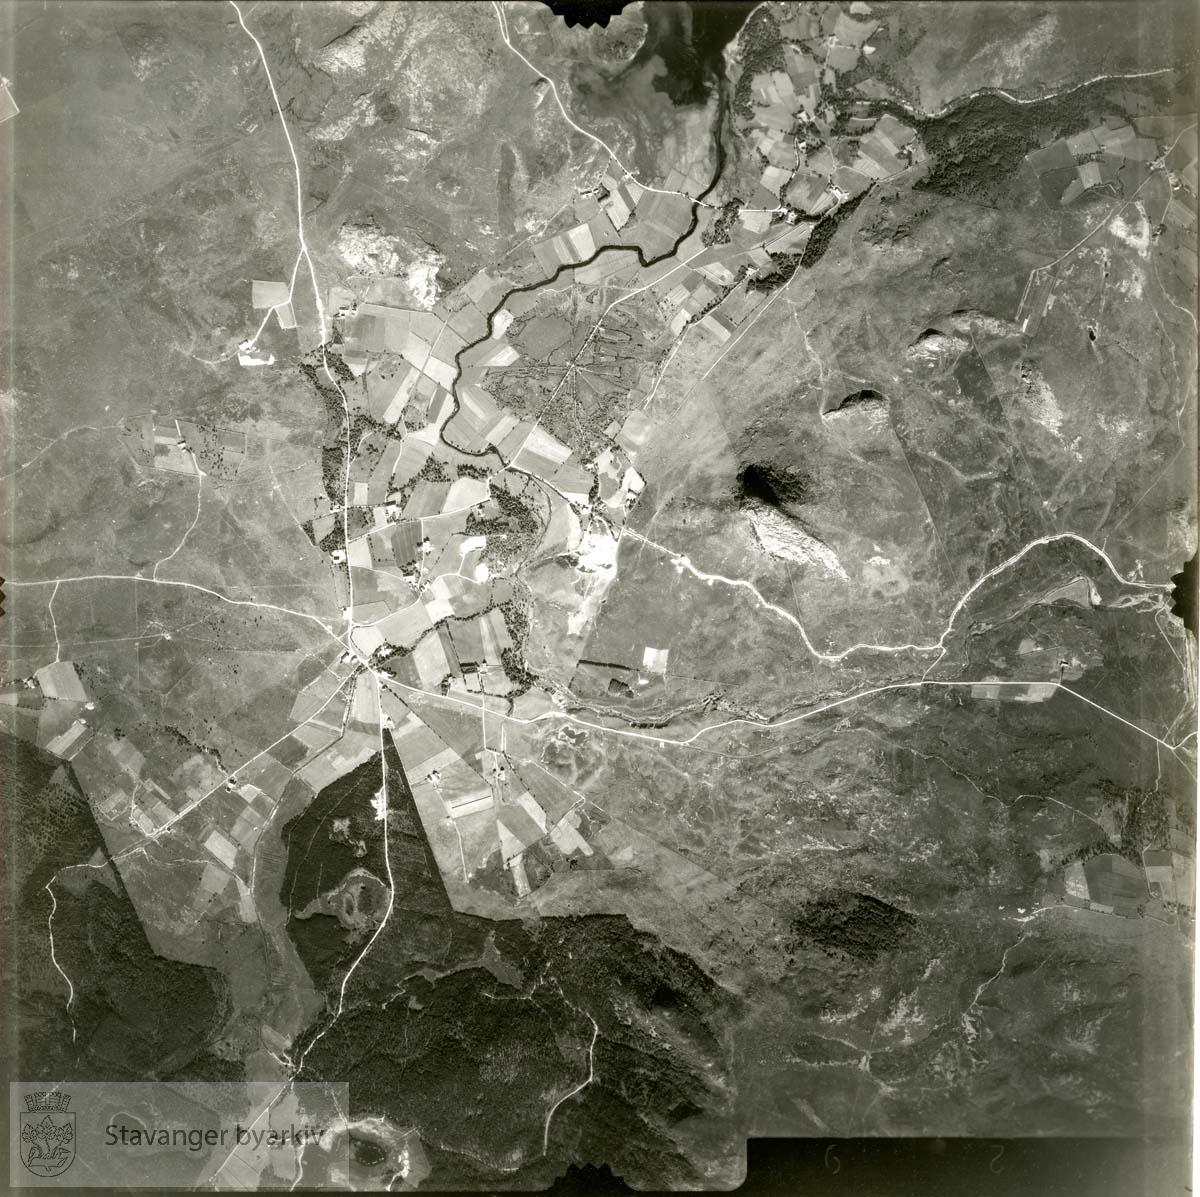 Jfr. kart/fotoplan H10/629..Sviland..Se ByStW_Uca_002 (kan lastes ned under fanen for kart på Stavangerbilder)